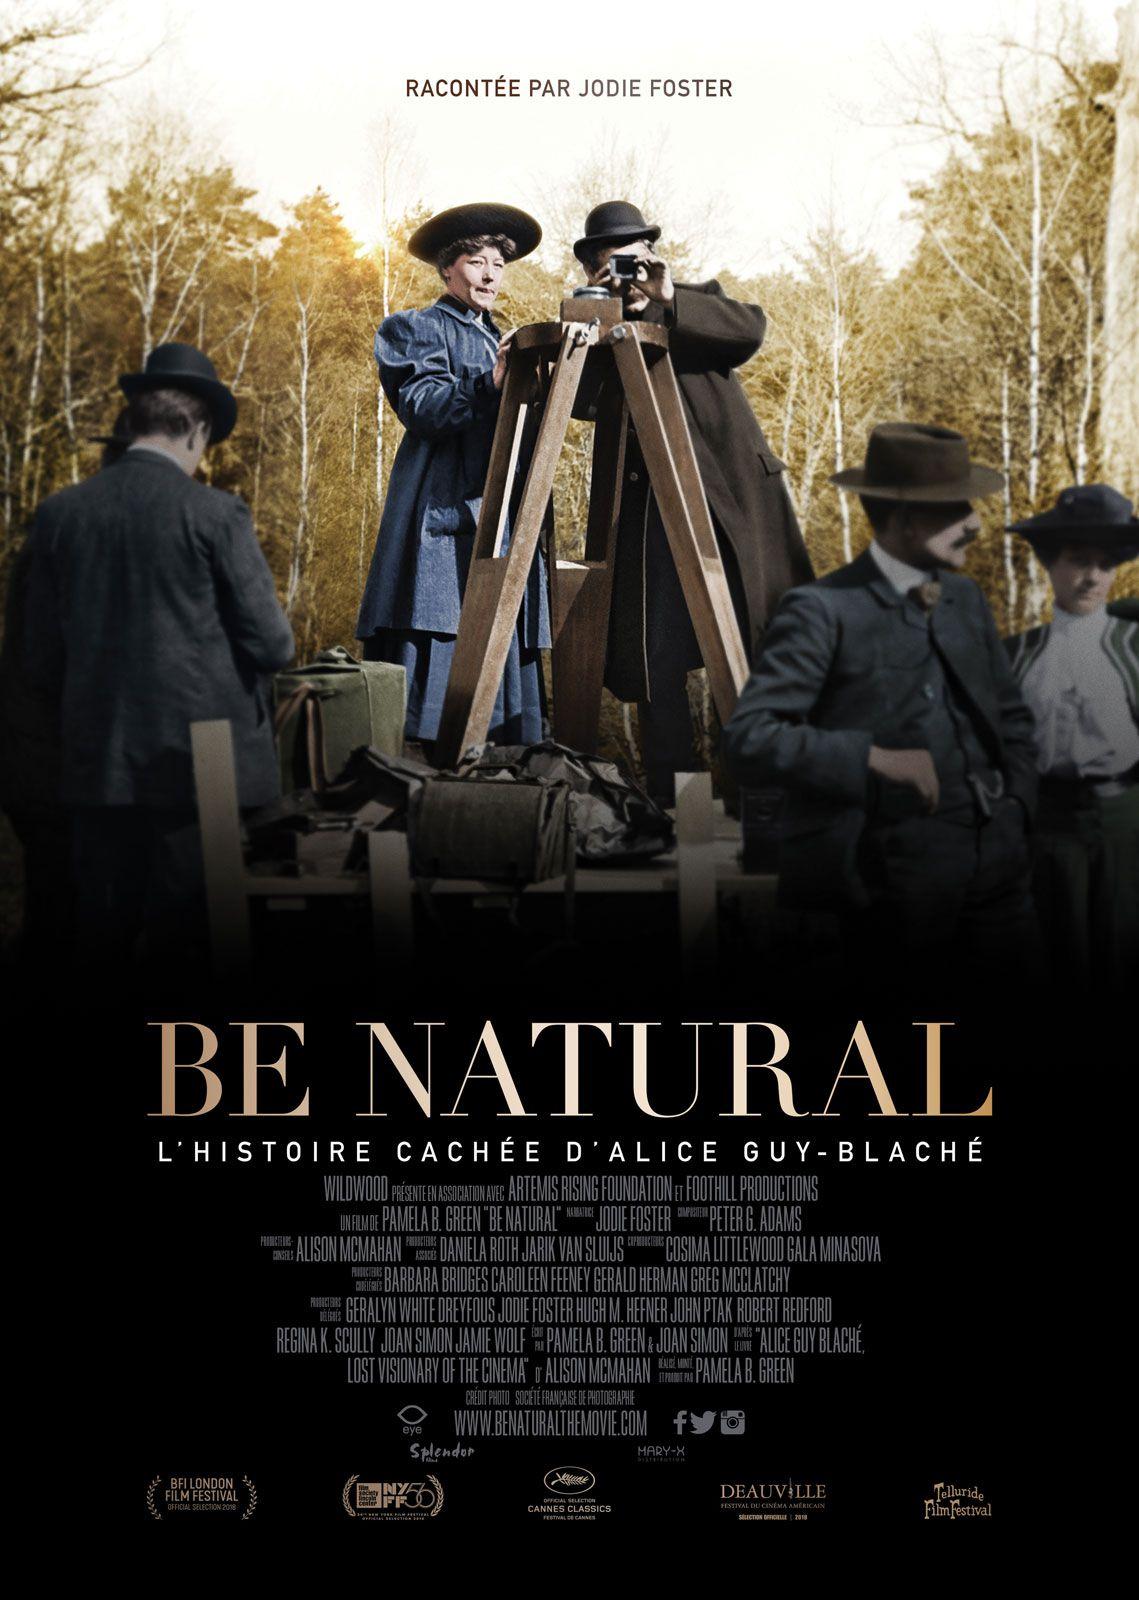 Be natural - L'histoire cachée d'Alice Guy-Blaché - Documentaire (2020)